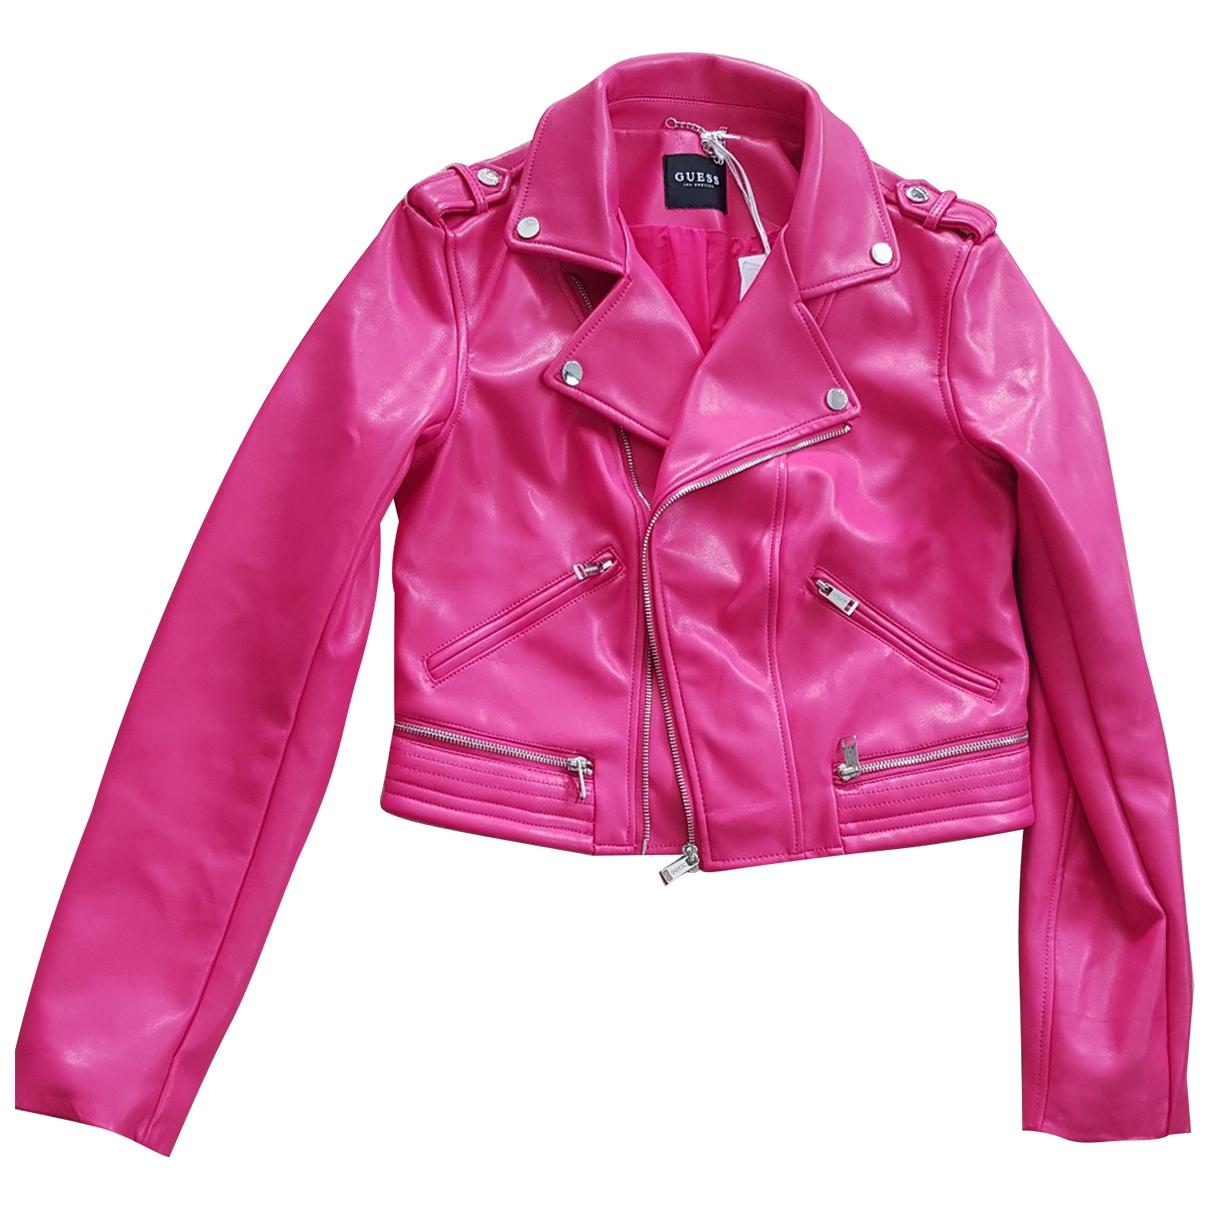 Guess \N Pink jacket for Women L International